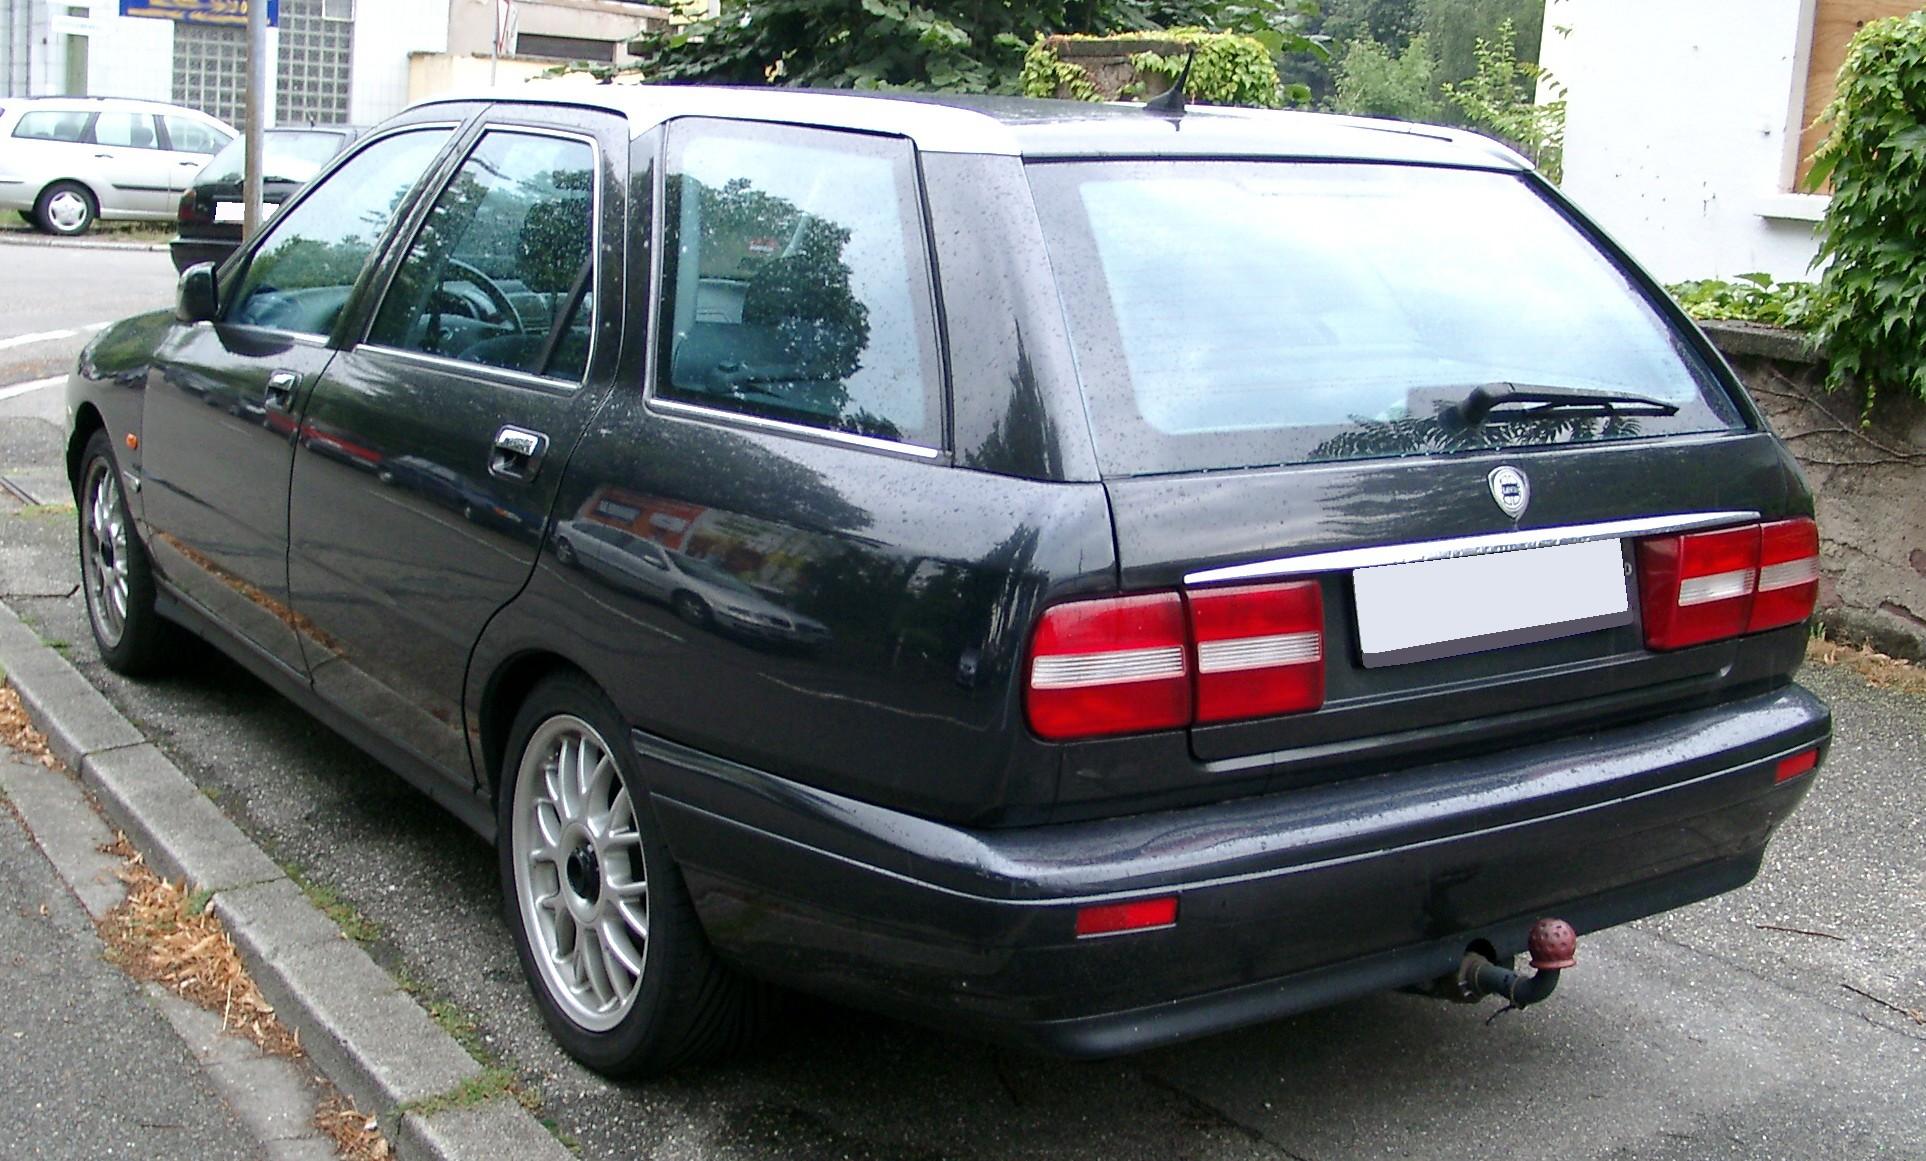 Lancia Kappa Station Wagon